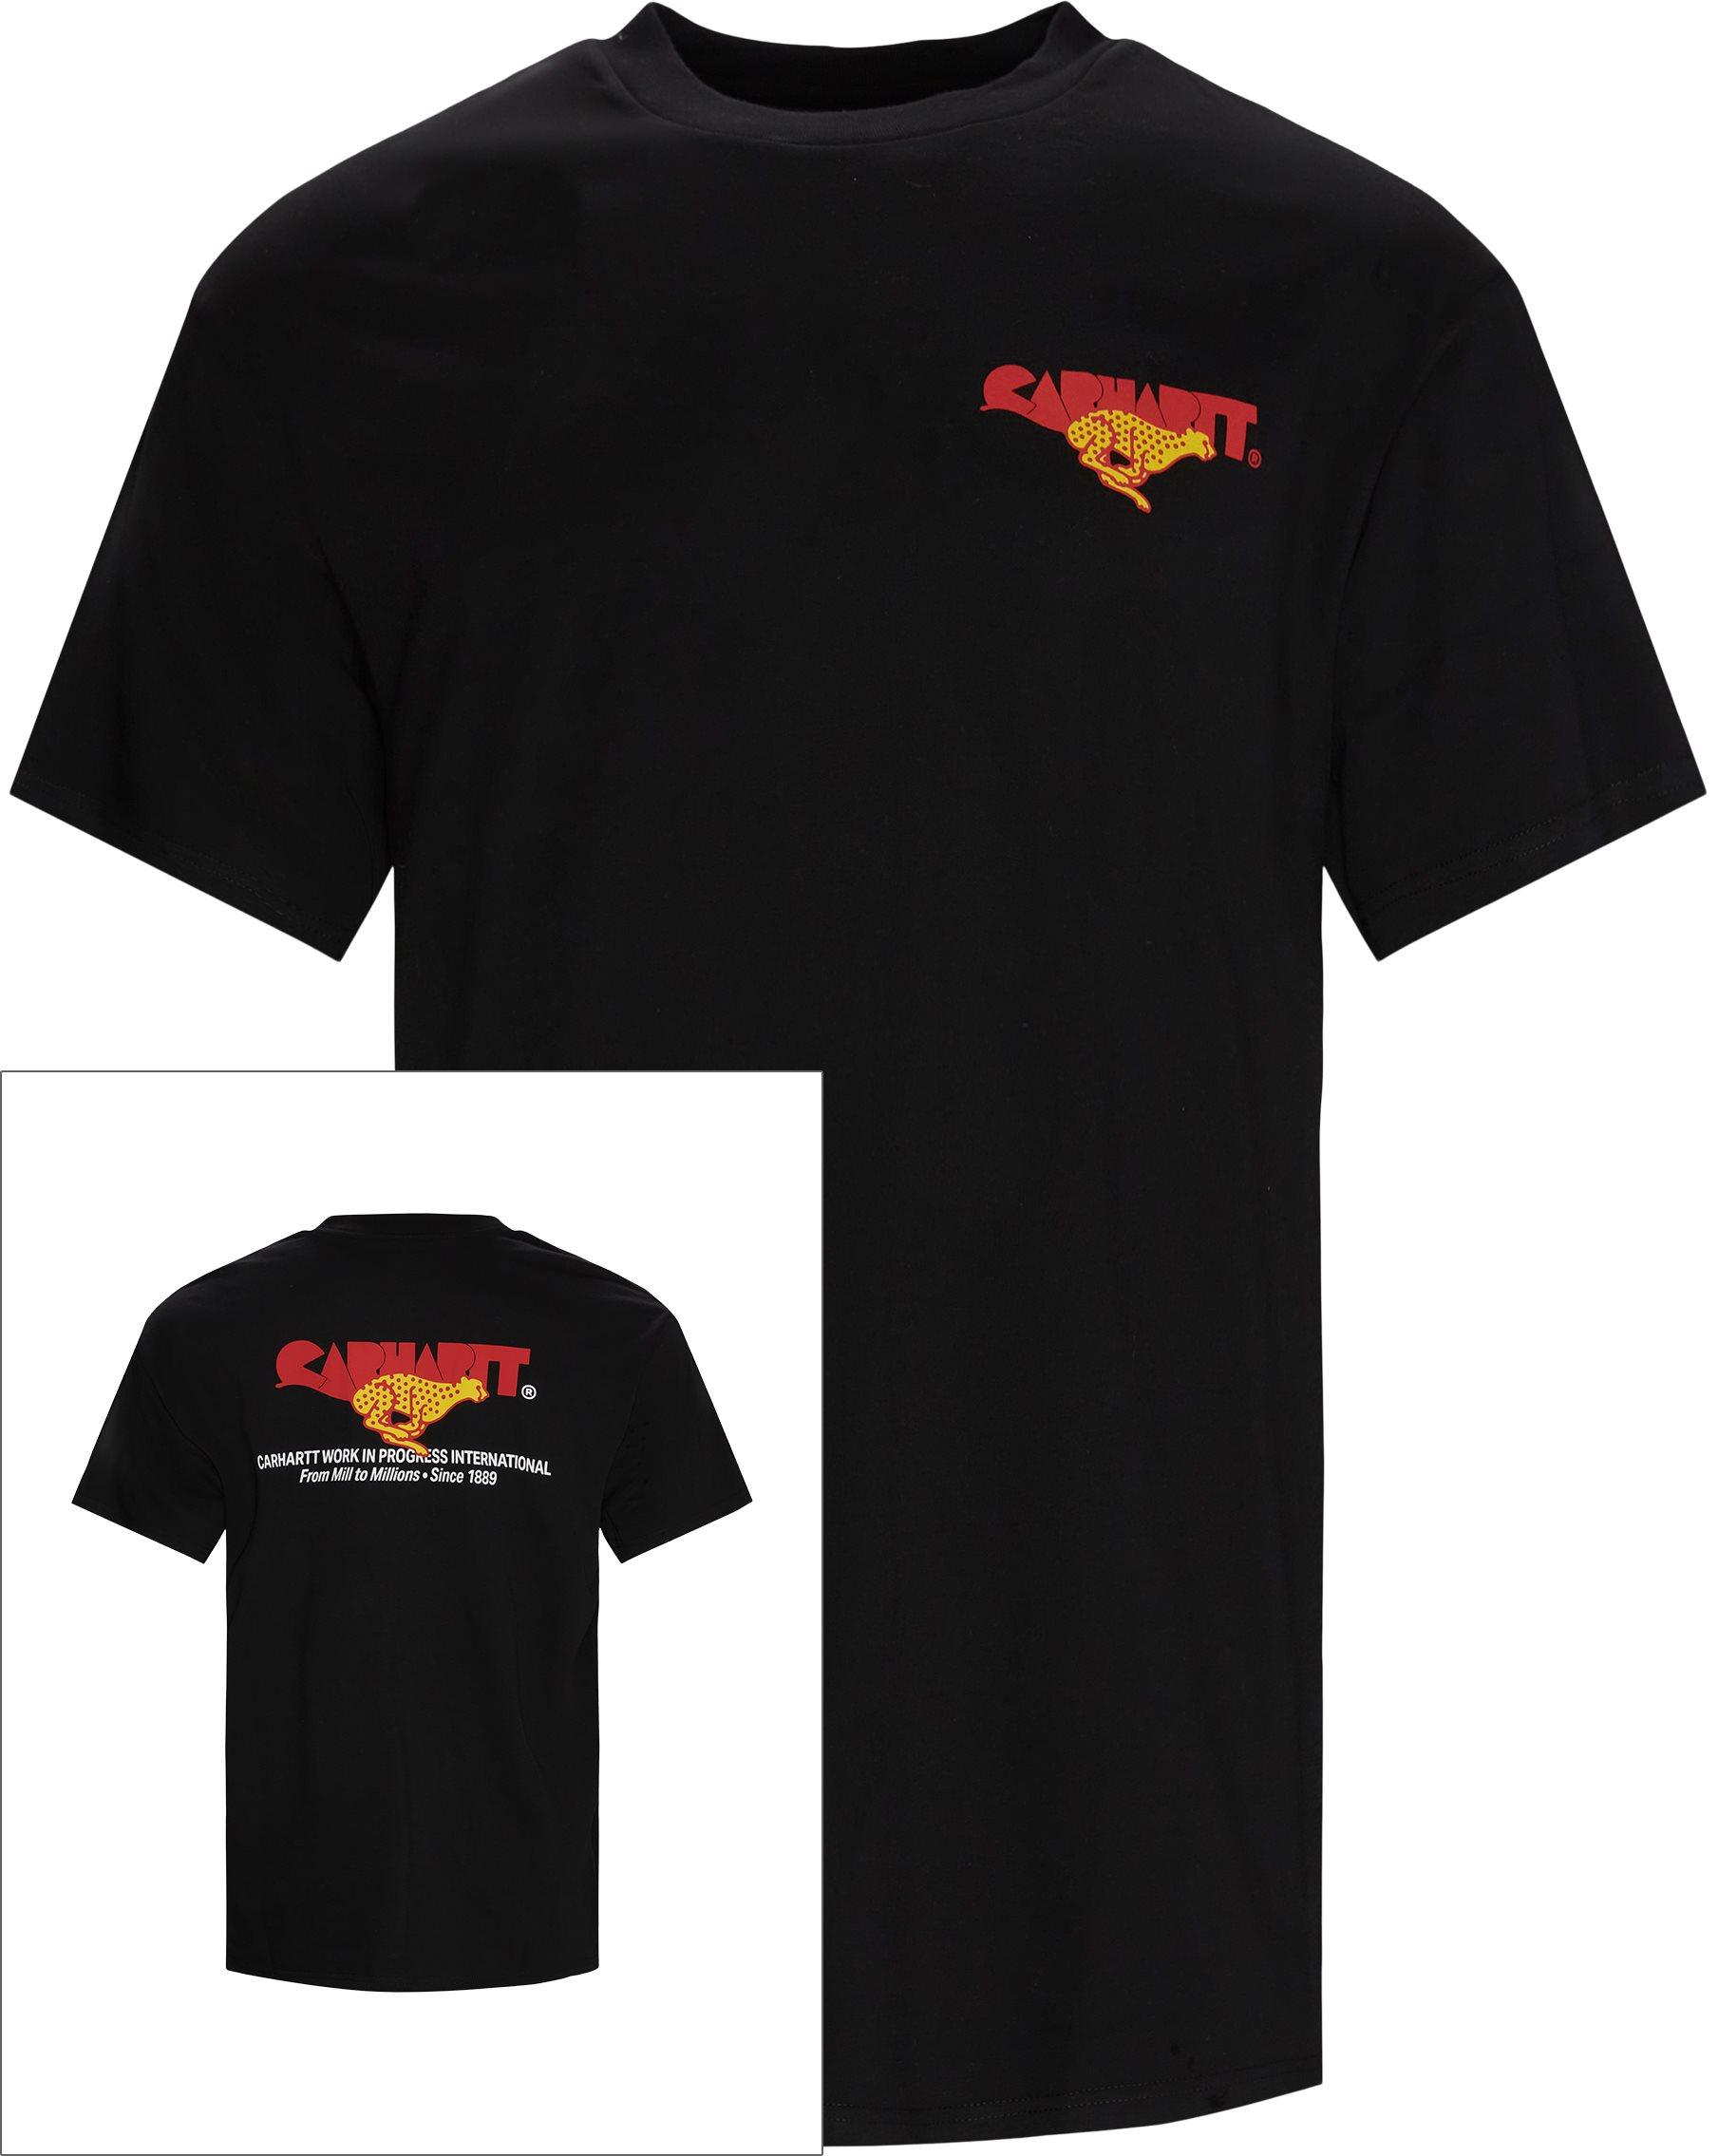 Runner Tee - T-shirts - Regular fit - Black